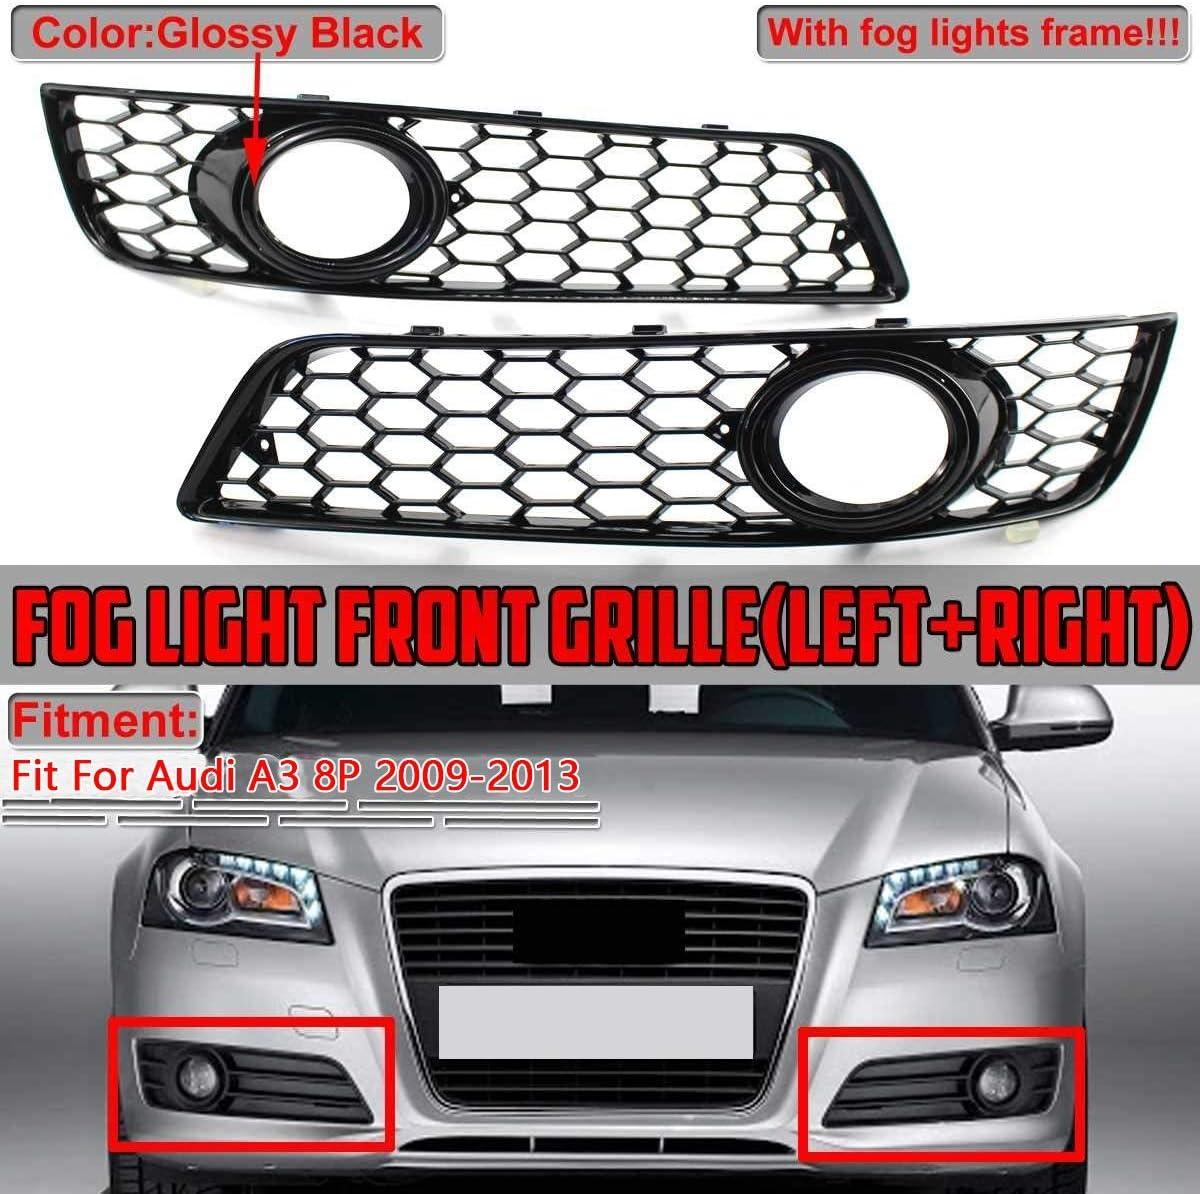 EIN Paar Auto Frontsto/ßstange Nebel-Licht-Lampe Honeycomb Grille Cover Fit for Audi A3 8P 2009-2013 Fog Light Grilles Nebelscheinwerfer Gitter Color : Chrome Silver